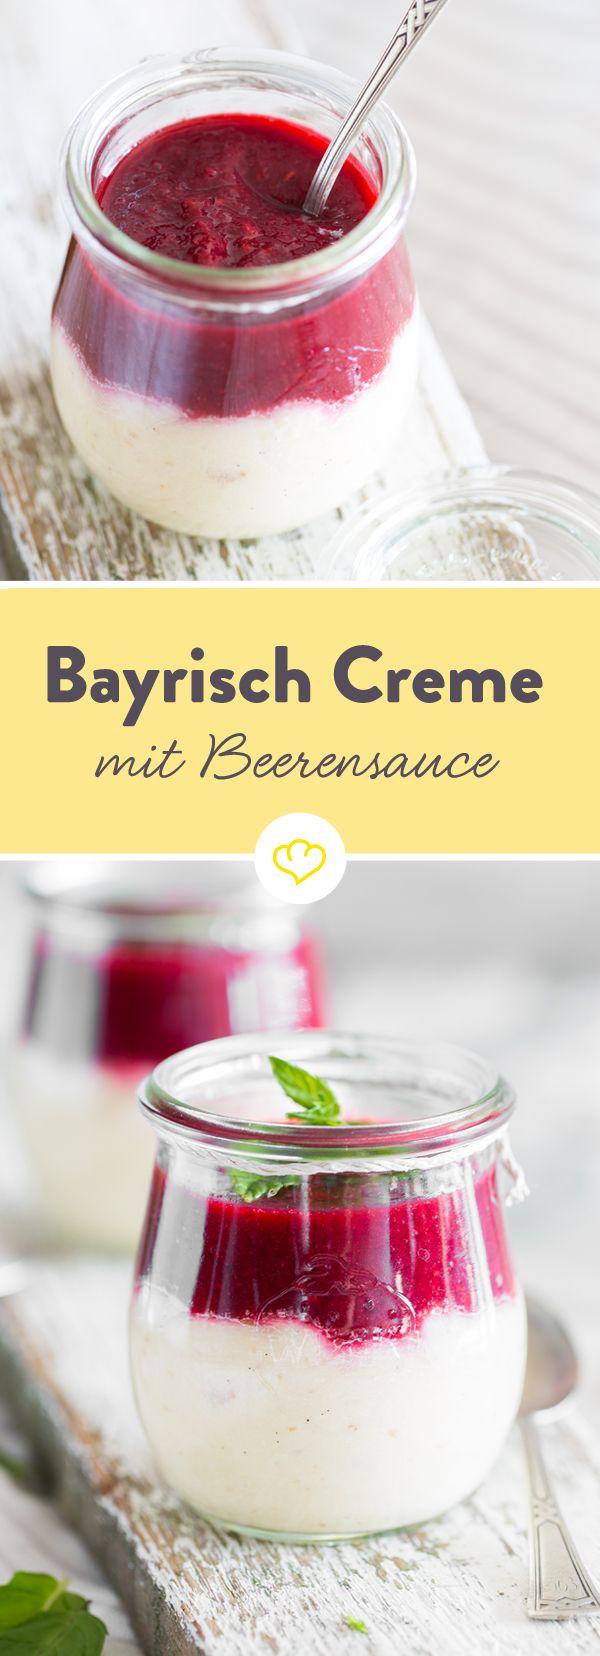 best 25 creme dessert ideas on pinterest creme liquide creme and creme dessert vanille. Black Bedroom Furniture Sets. Home Design Ideas